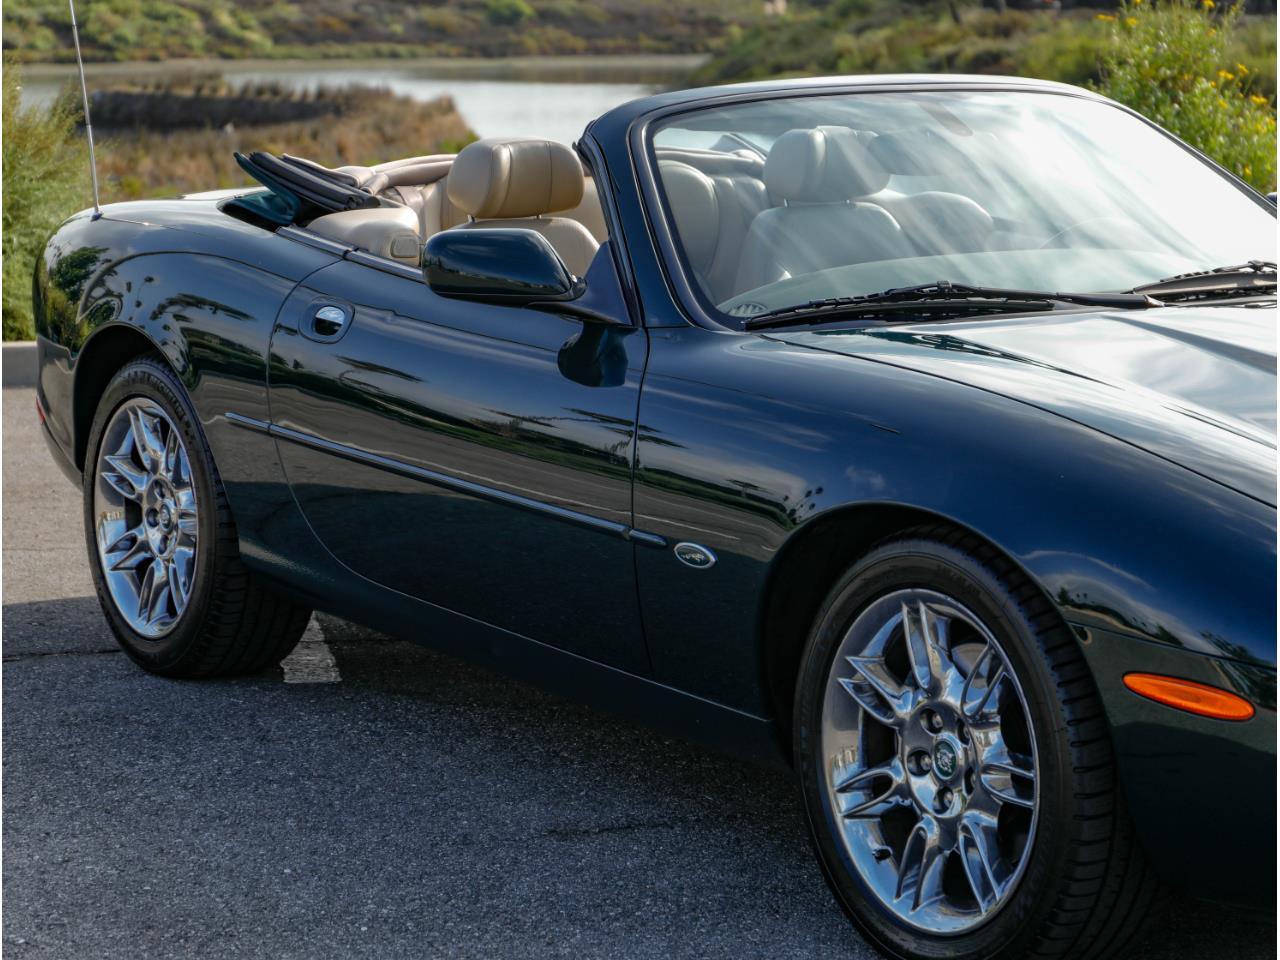 2002 Jaguar XK8 (CC-1258239) for sale in Marina Del Rey, California